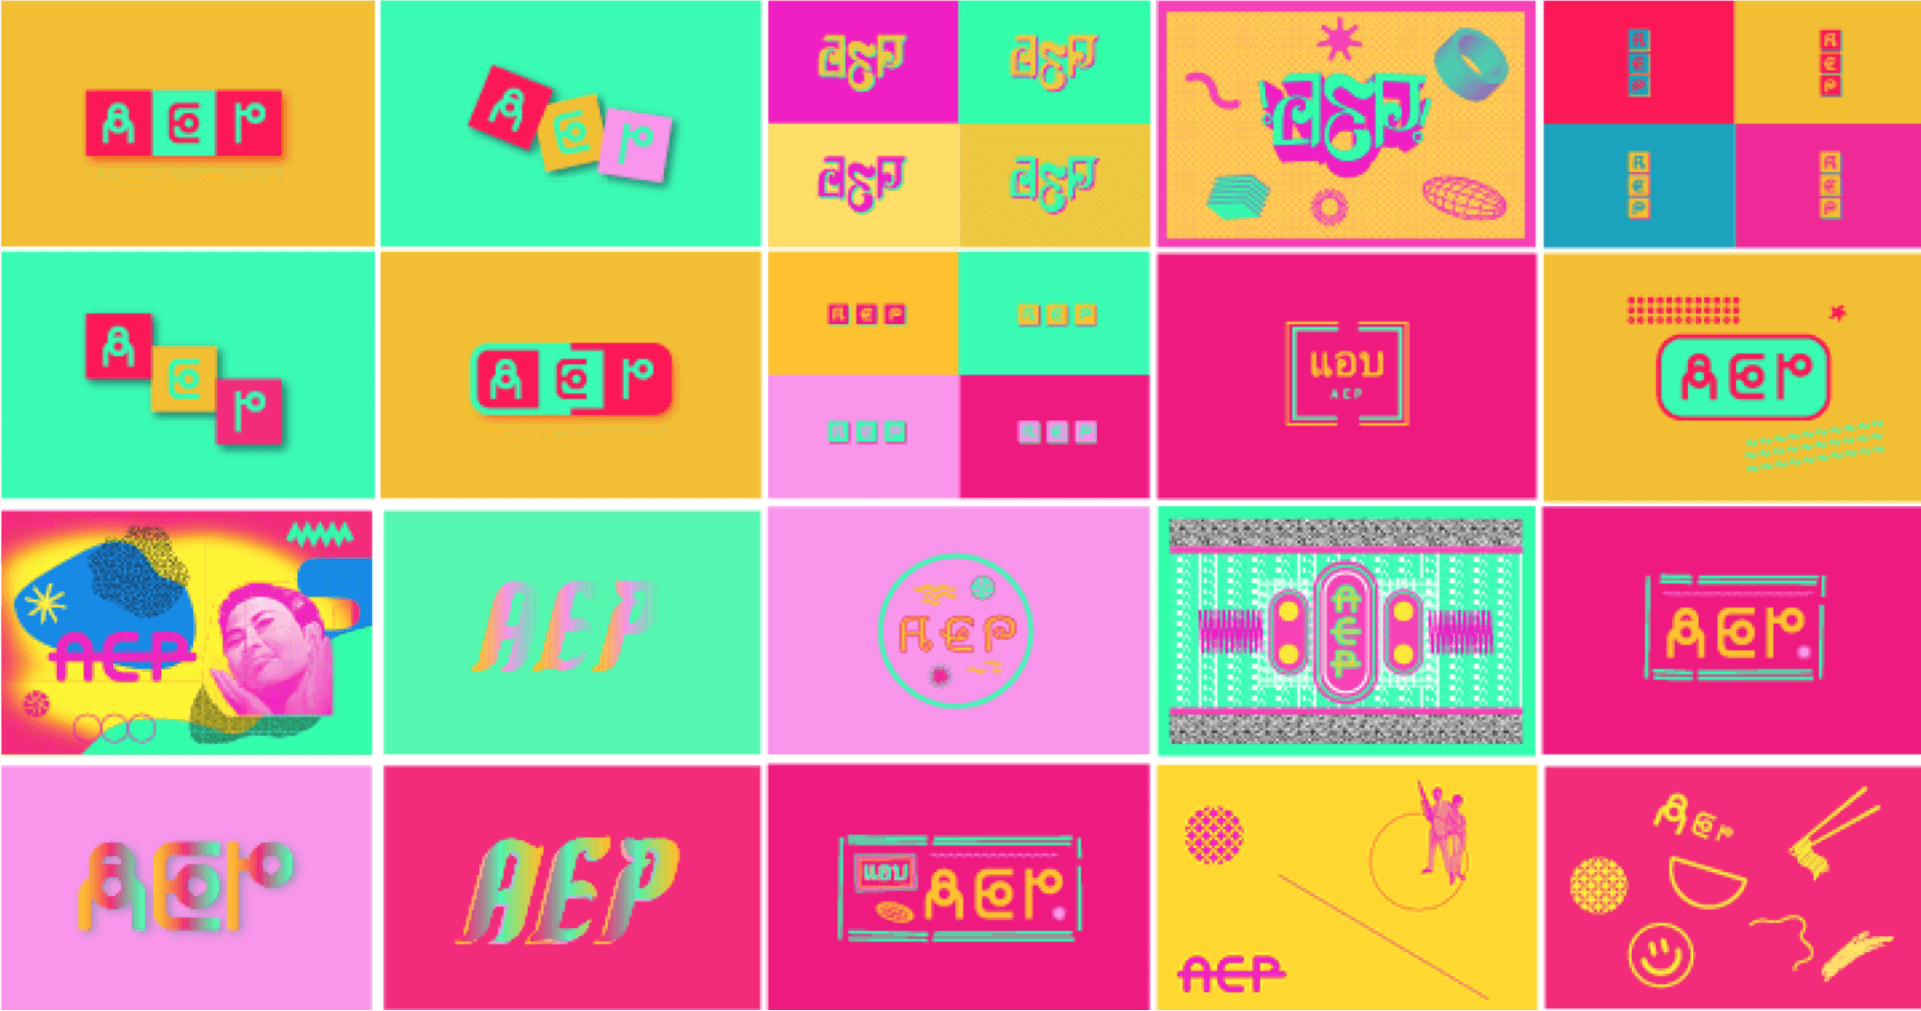 SSWeb-AEP-Iteration 1